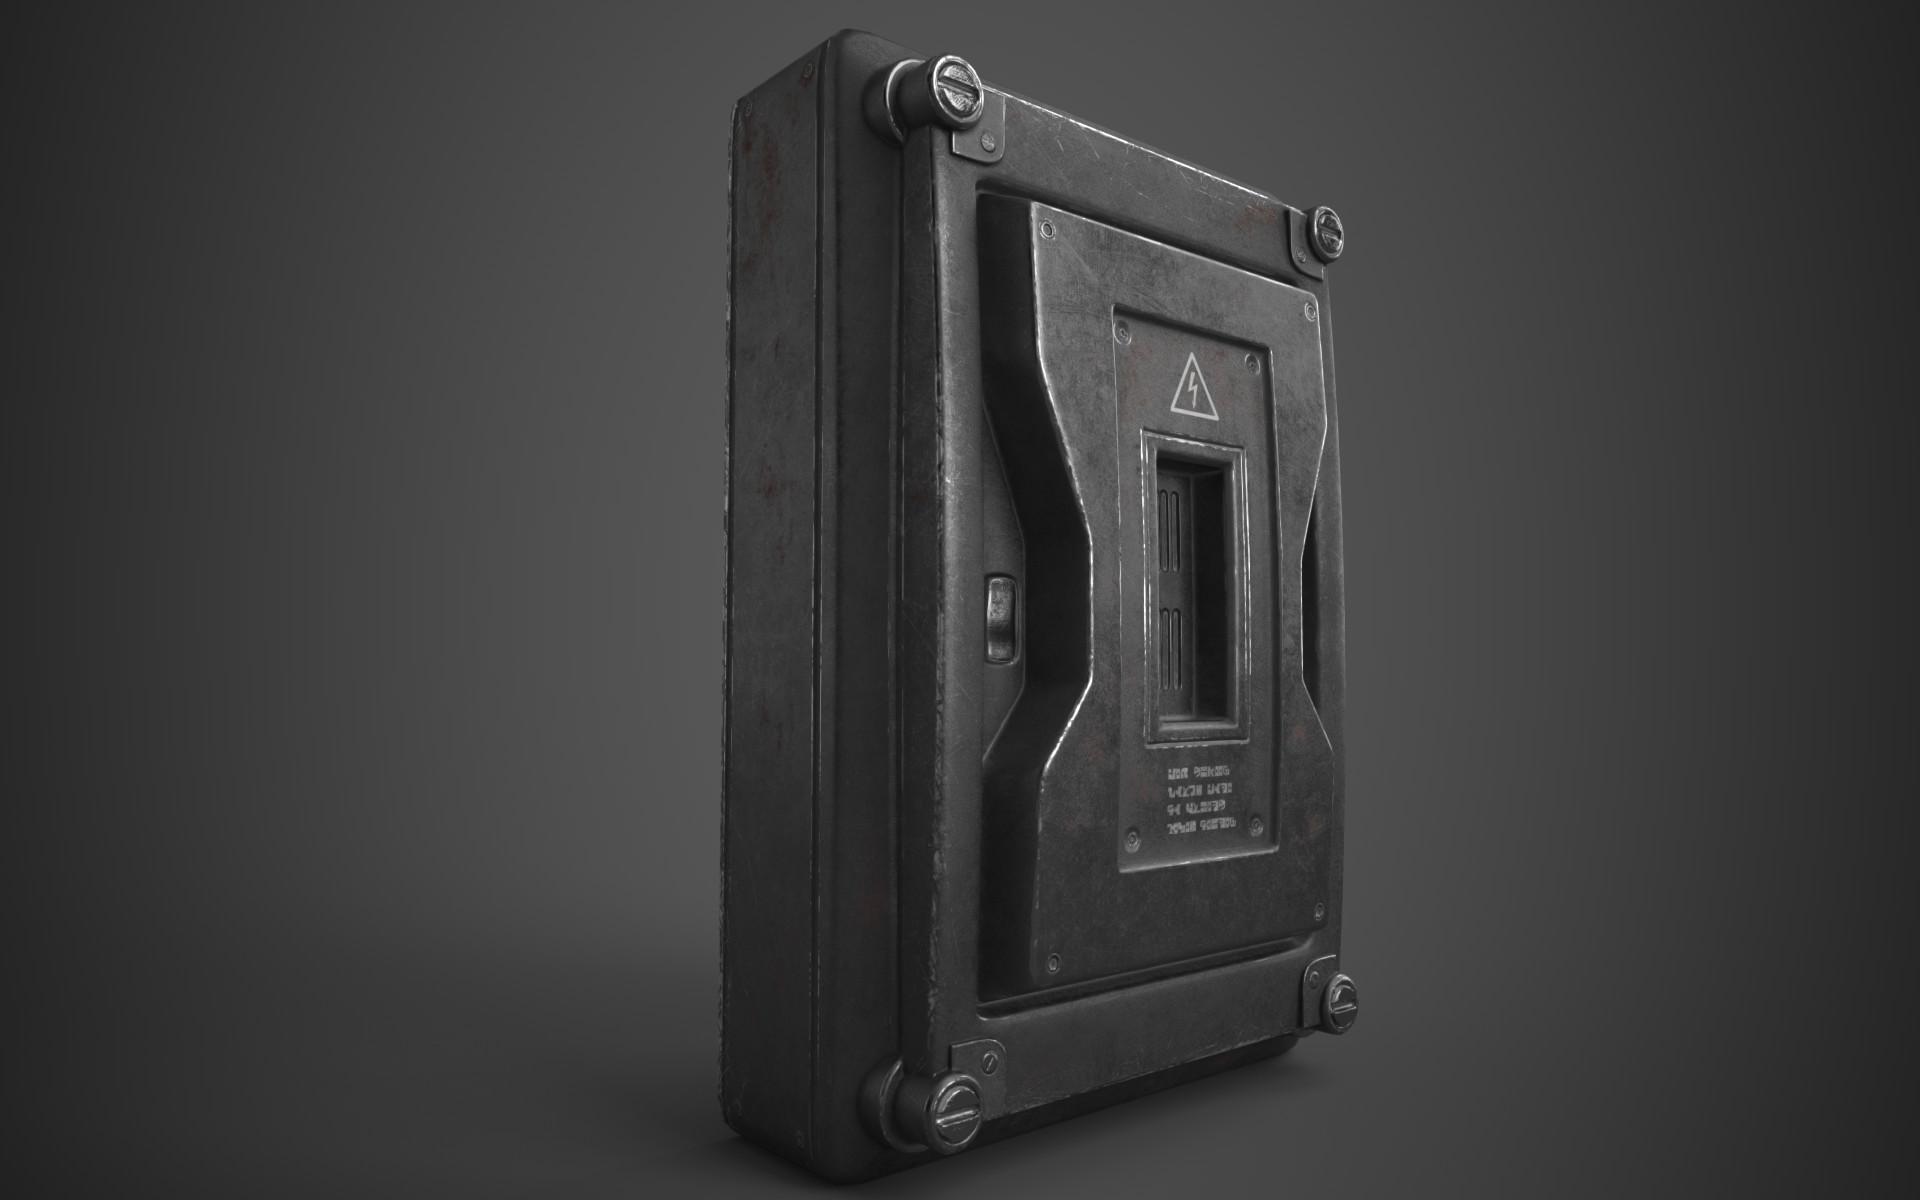 jonas meyer fuse box [ 1920 x 1200 Pixel ]